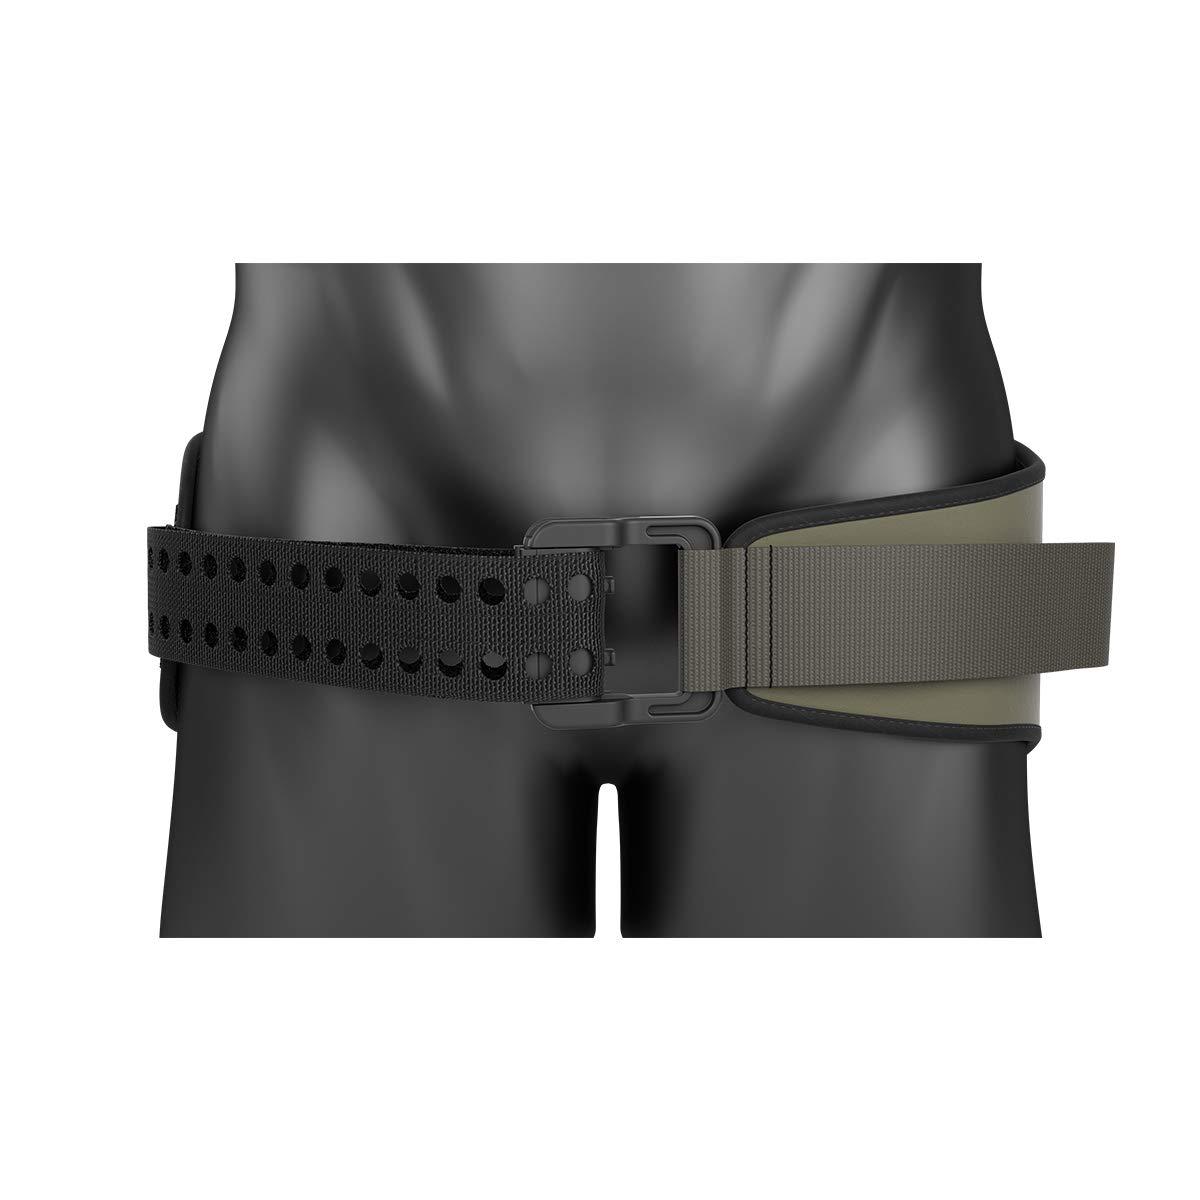 SAM Pelvic Sling II - Standard Size 32''-50'' - Black & Green